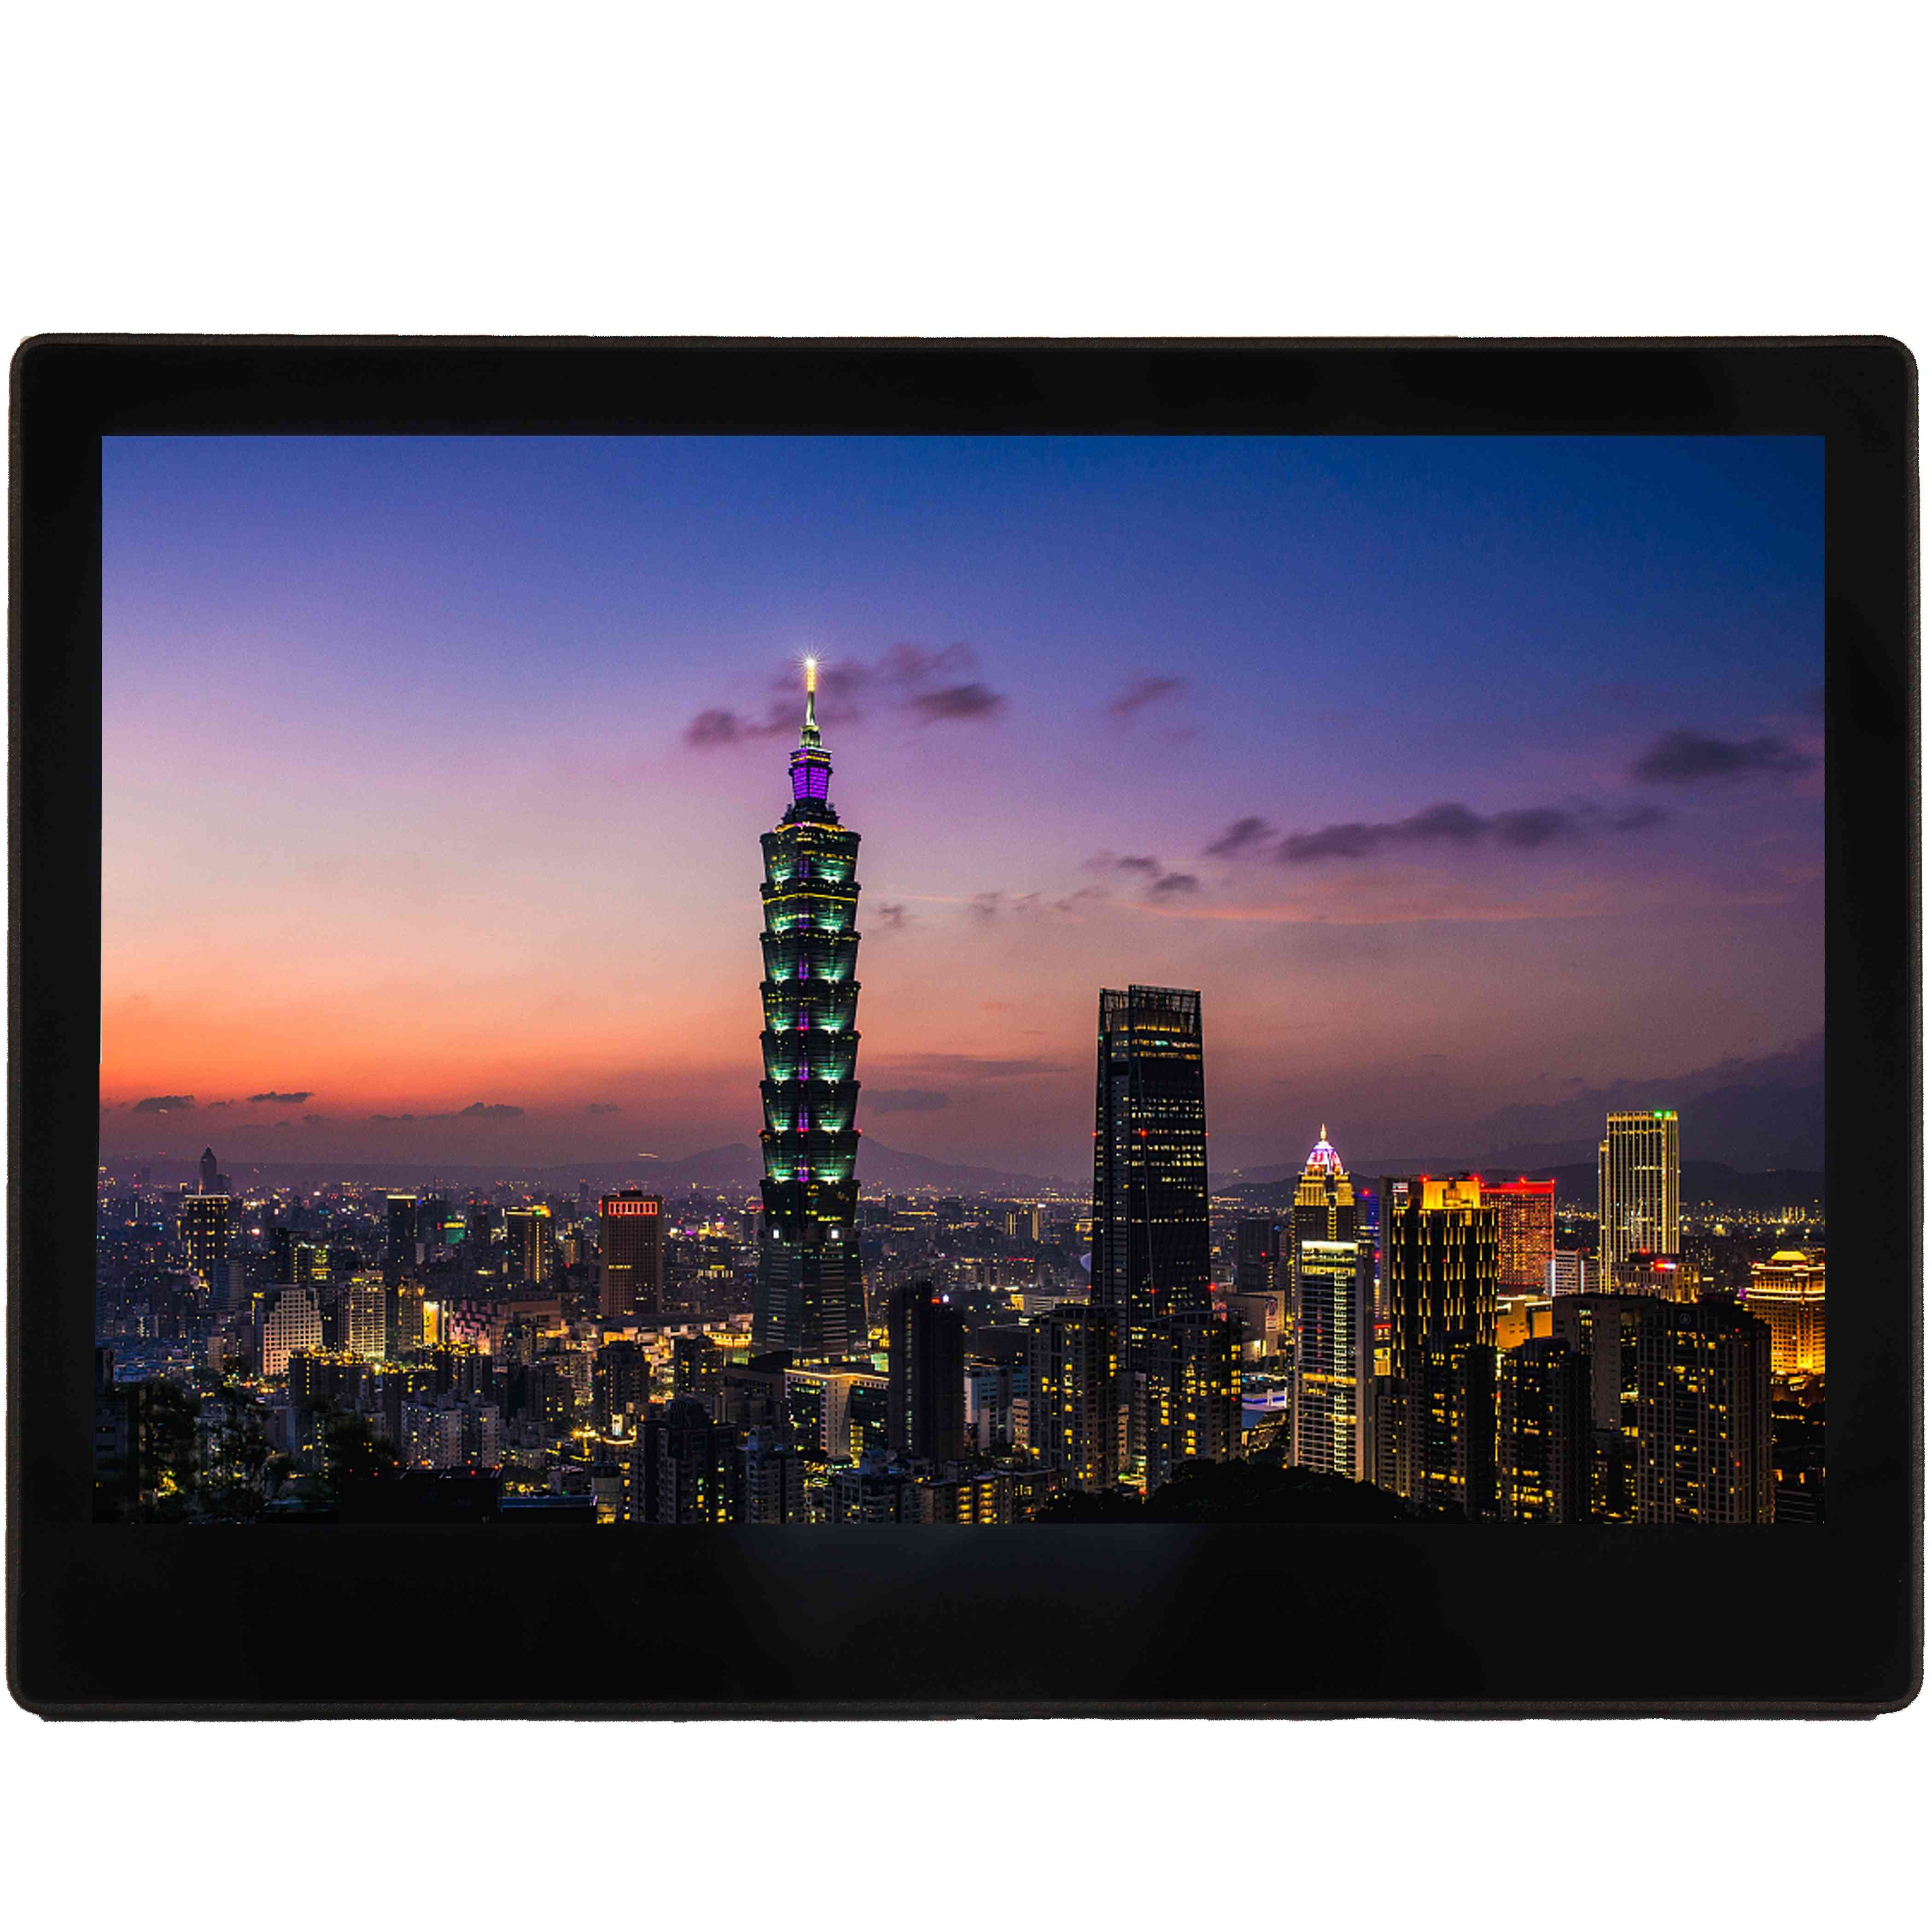 10.1 Inch Ips Hd Touch Screen - Quad Core Processor Calendar Clock